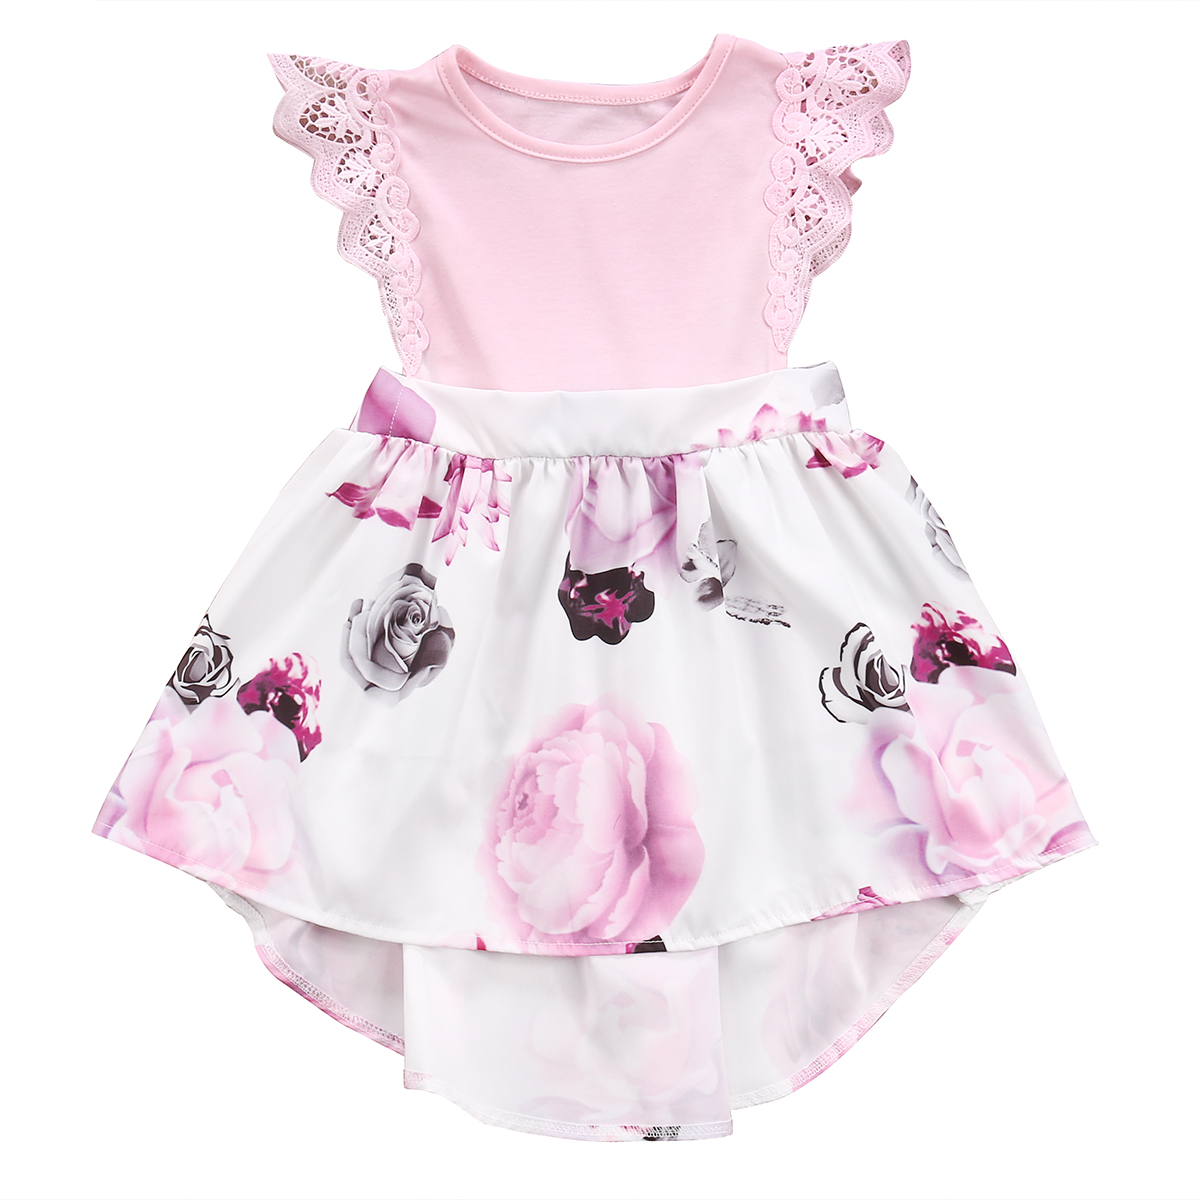 Kid Baby Girls Toddler Short Sleeve Summer Flower Tutu Princess Party Mini Dress